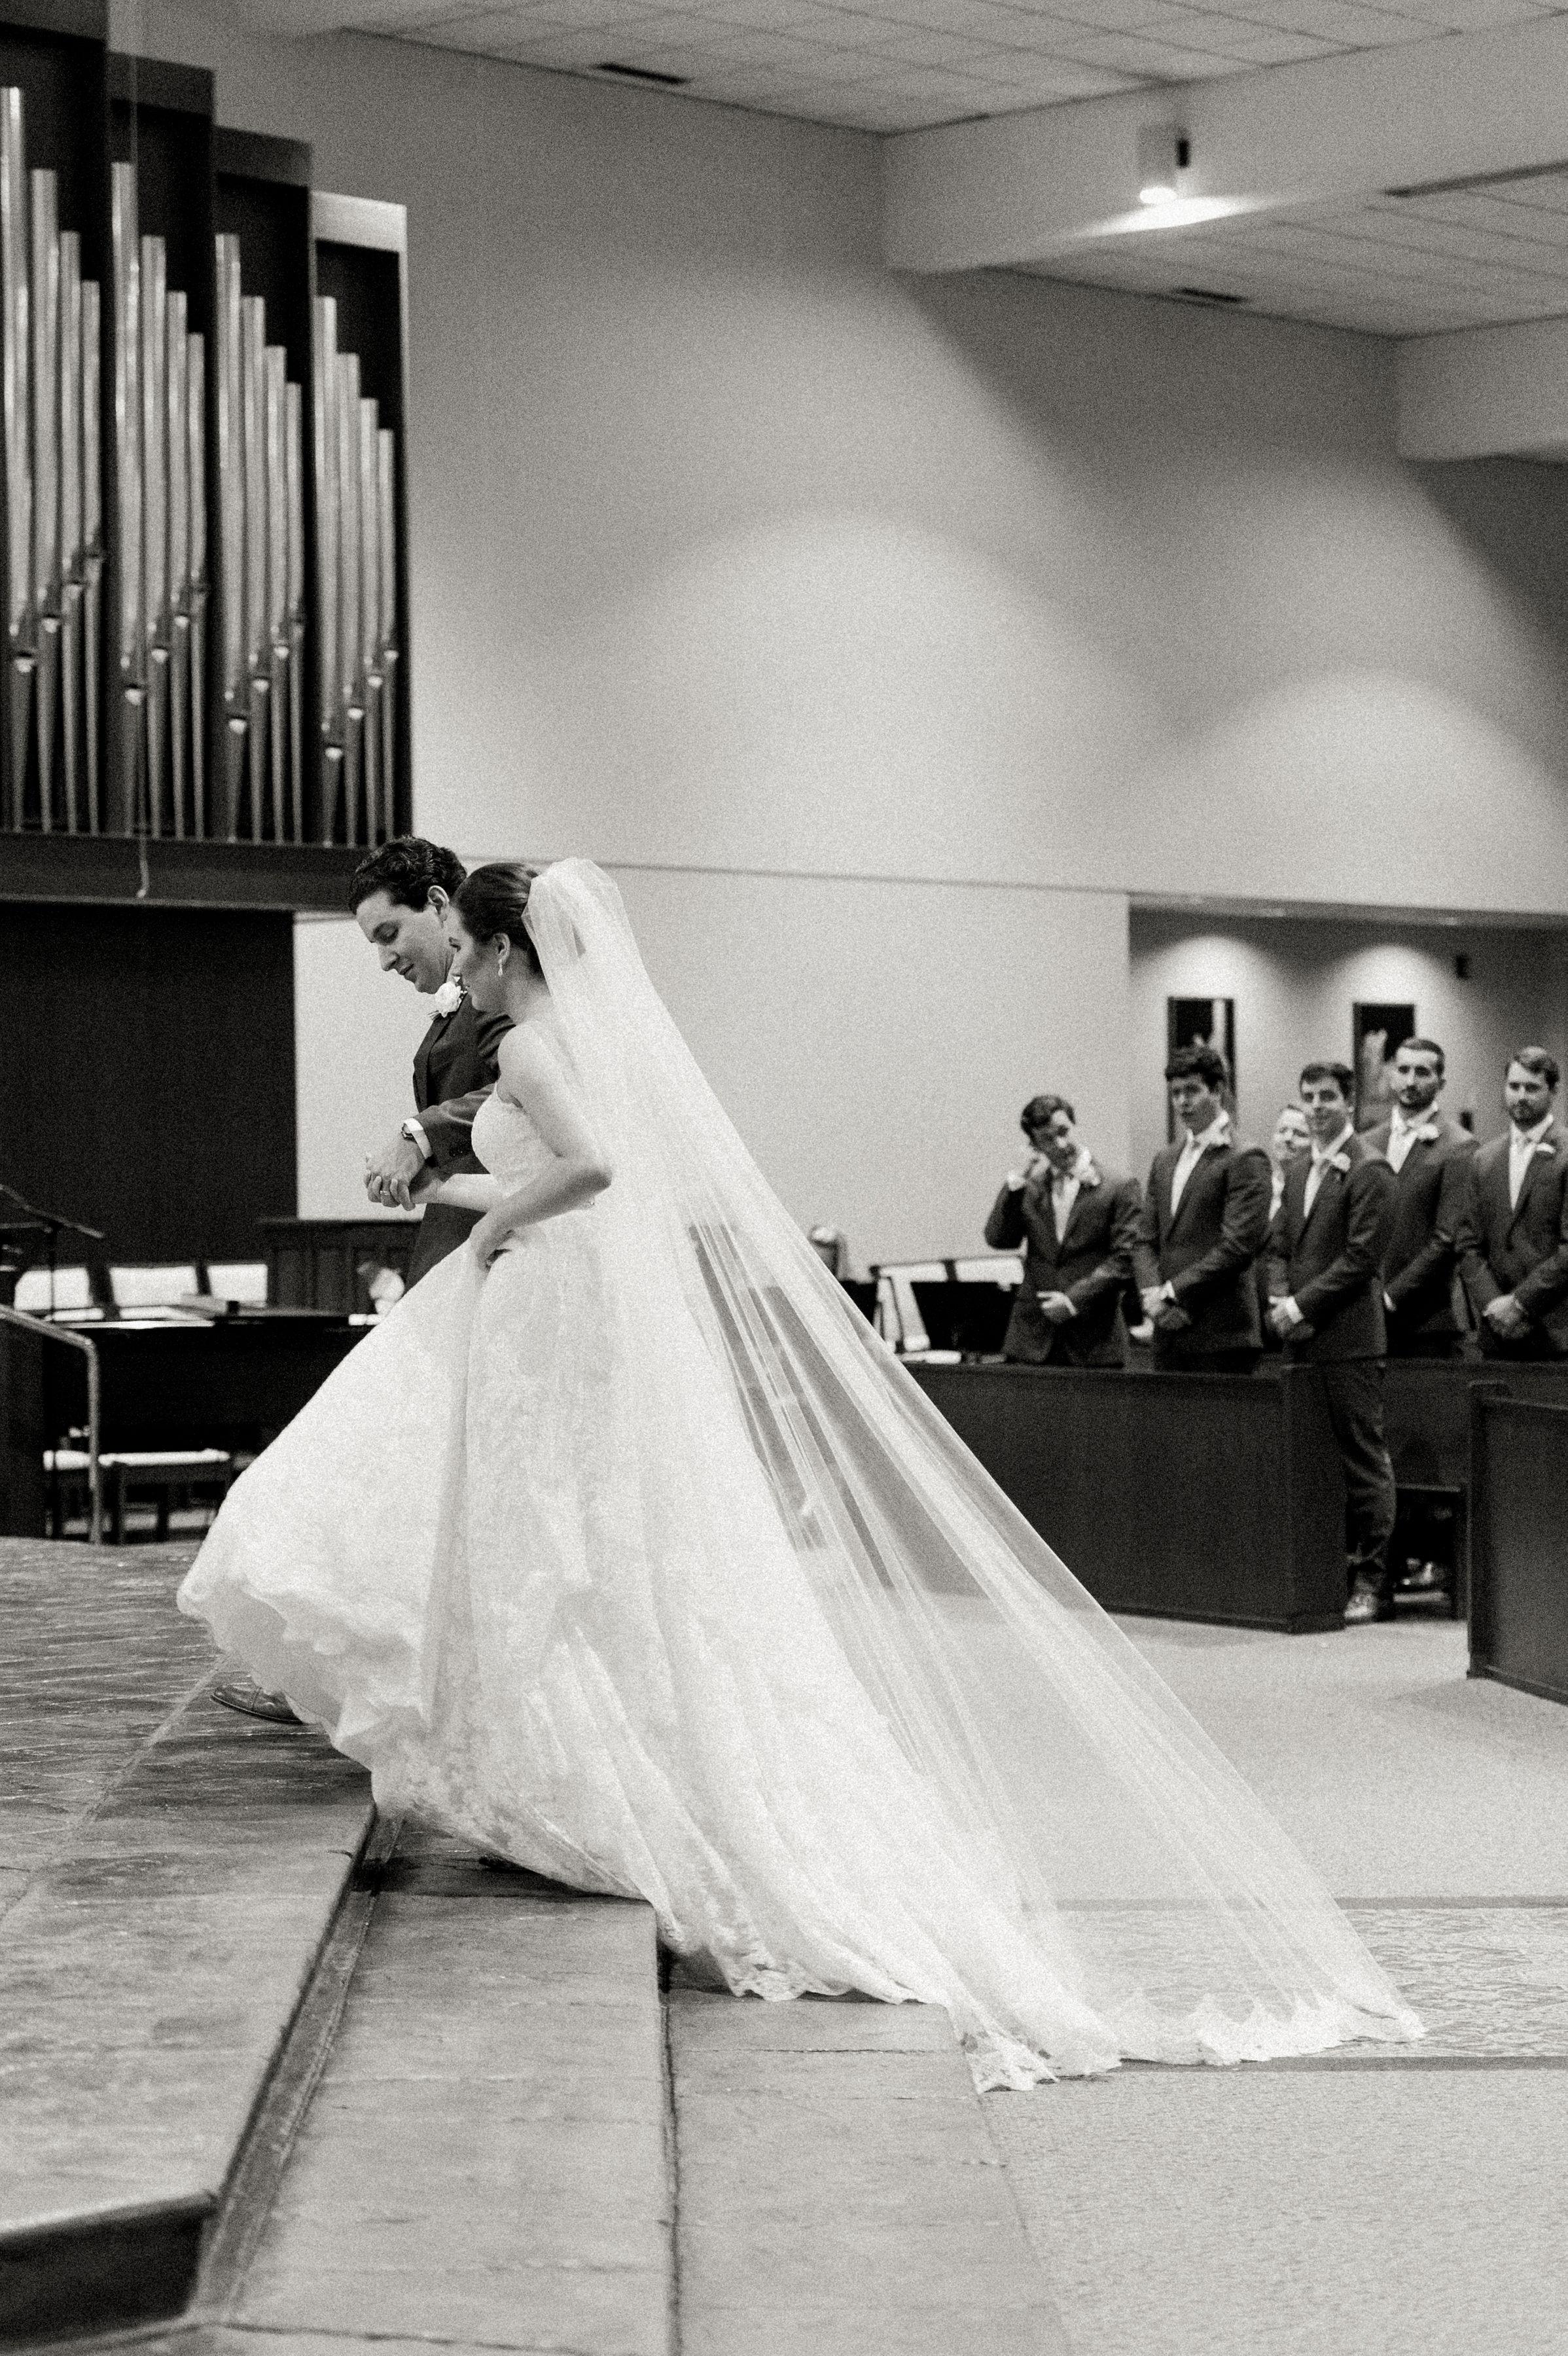 McElravey_Wedding_CarolineLimaPhotography_2018_131.jpg